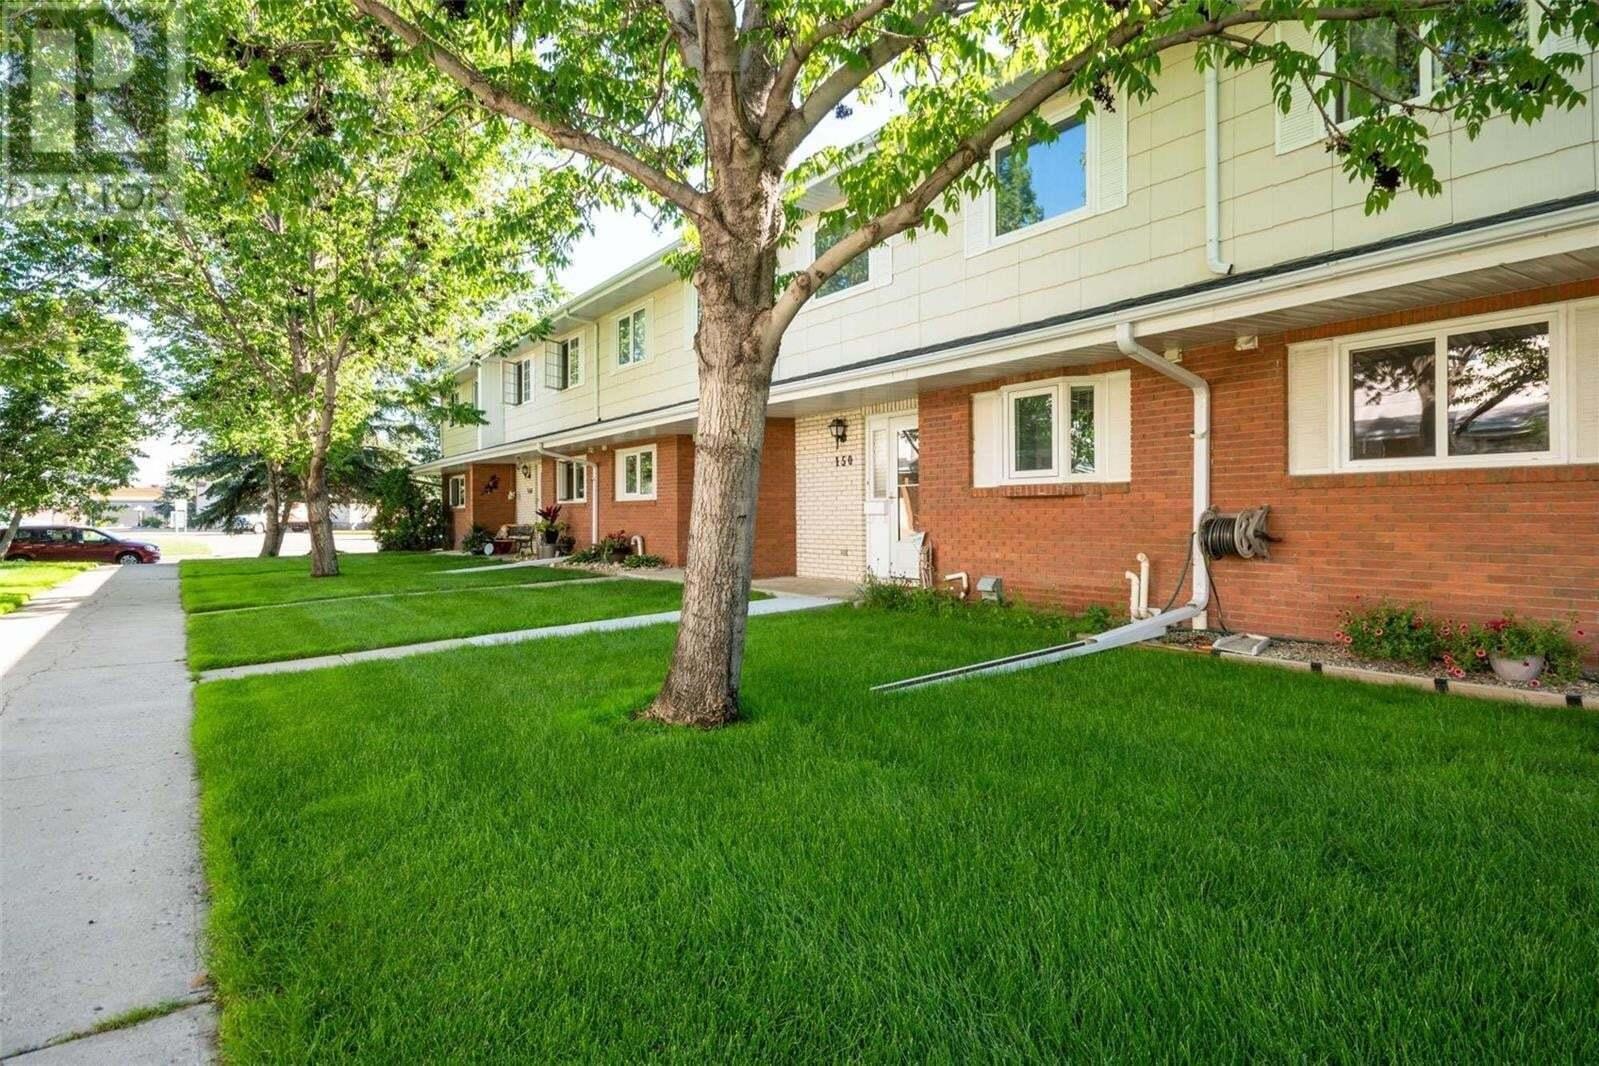 Townhouse for sale at 150 Plainsview Dr Regina Saskatchewan - MLS: SK816939